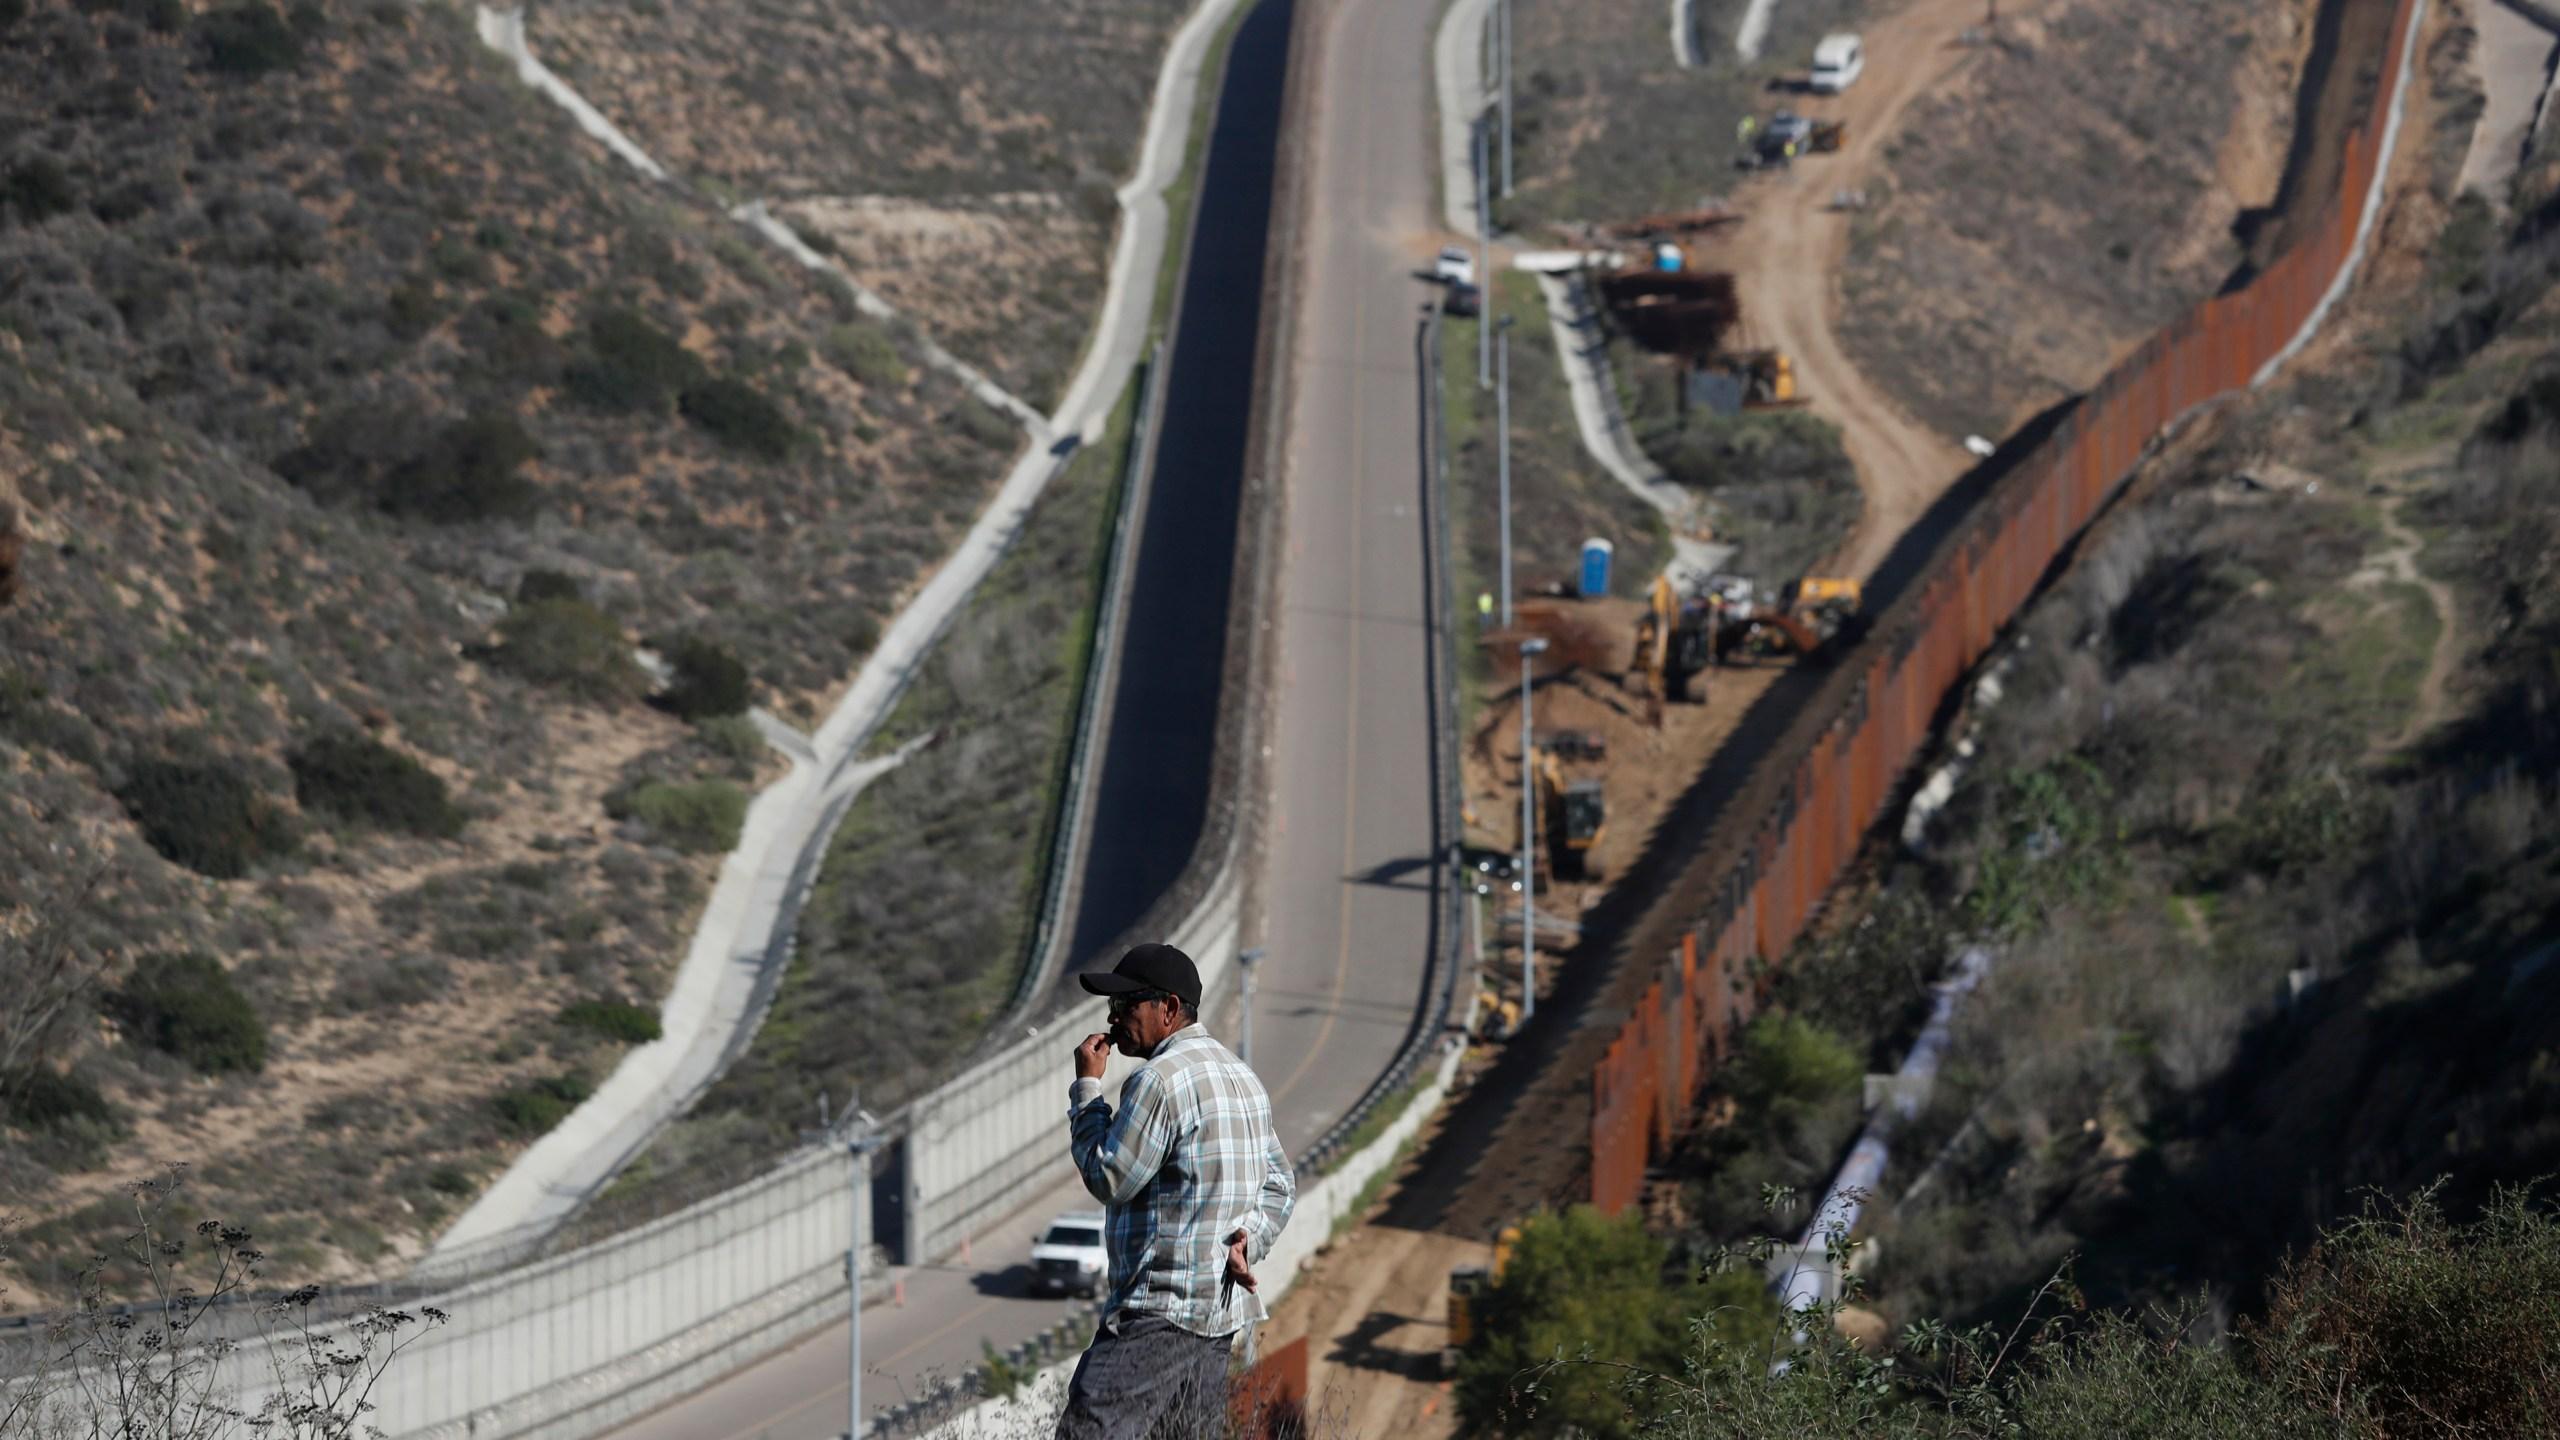 Mexico_US_Border_86862-159532.jpg40068848